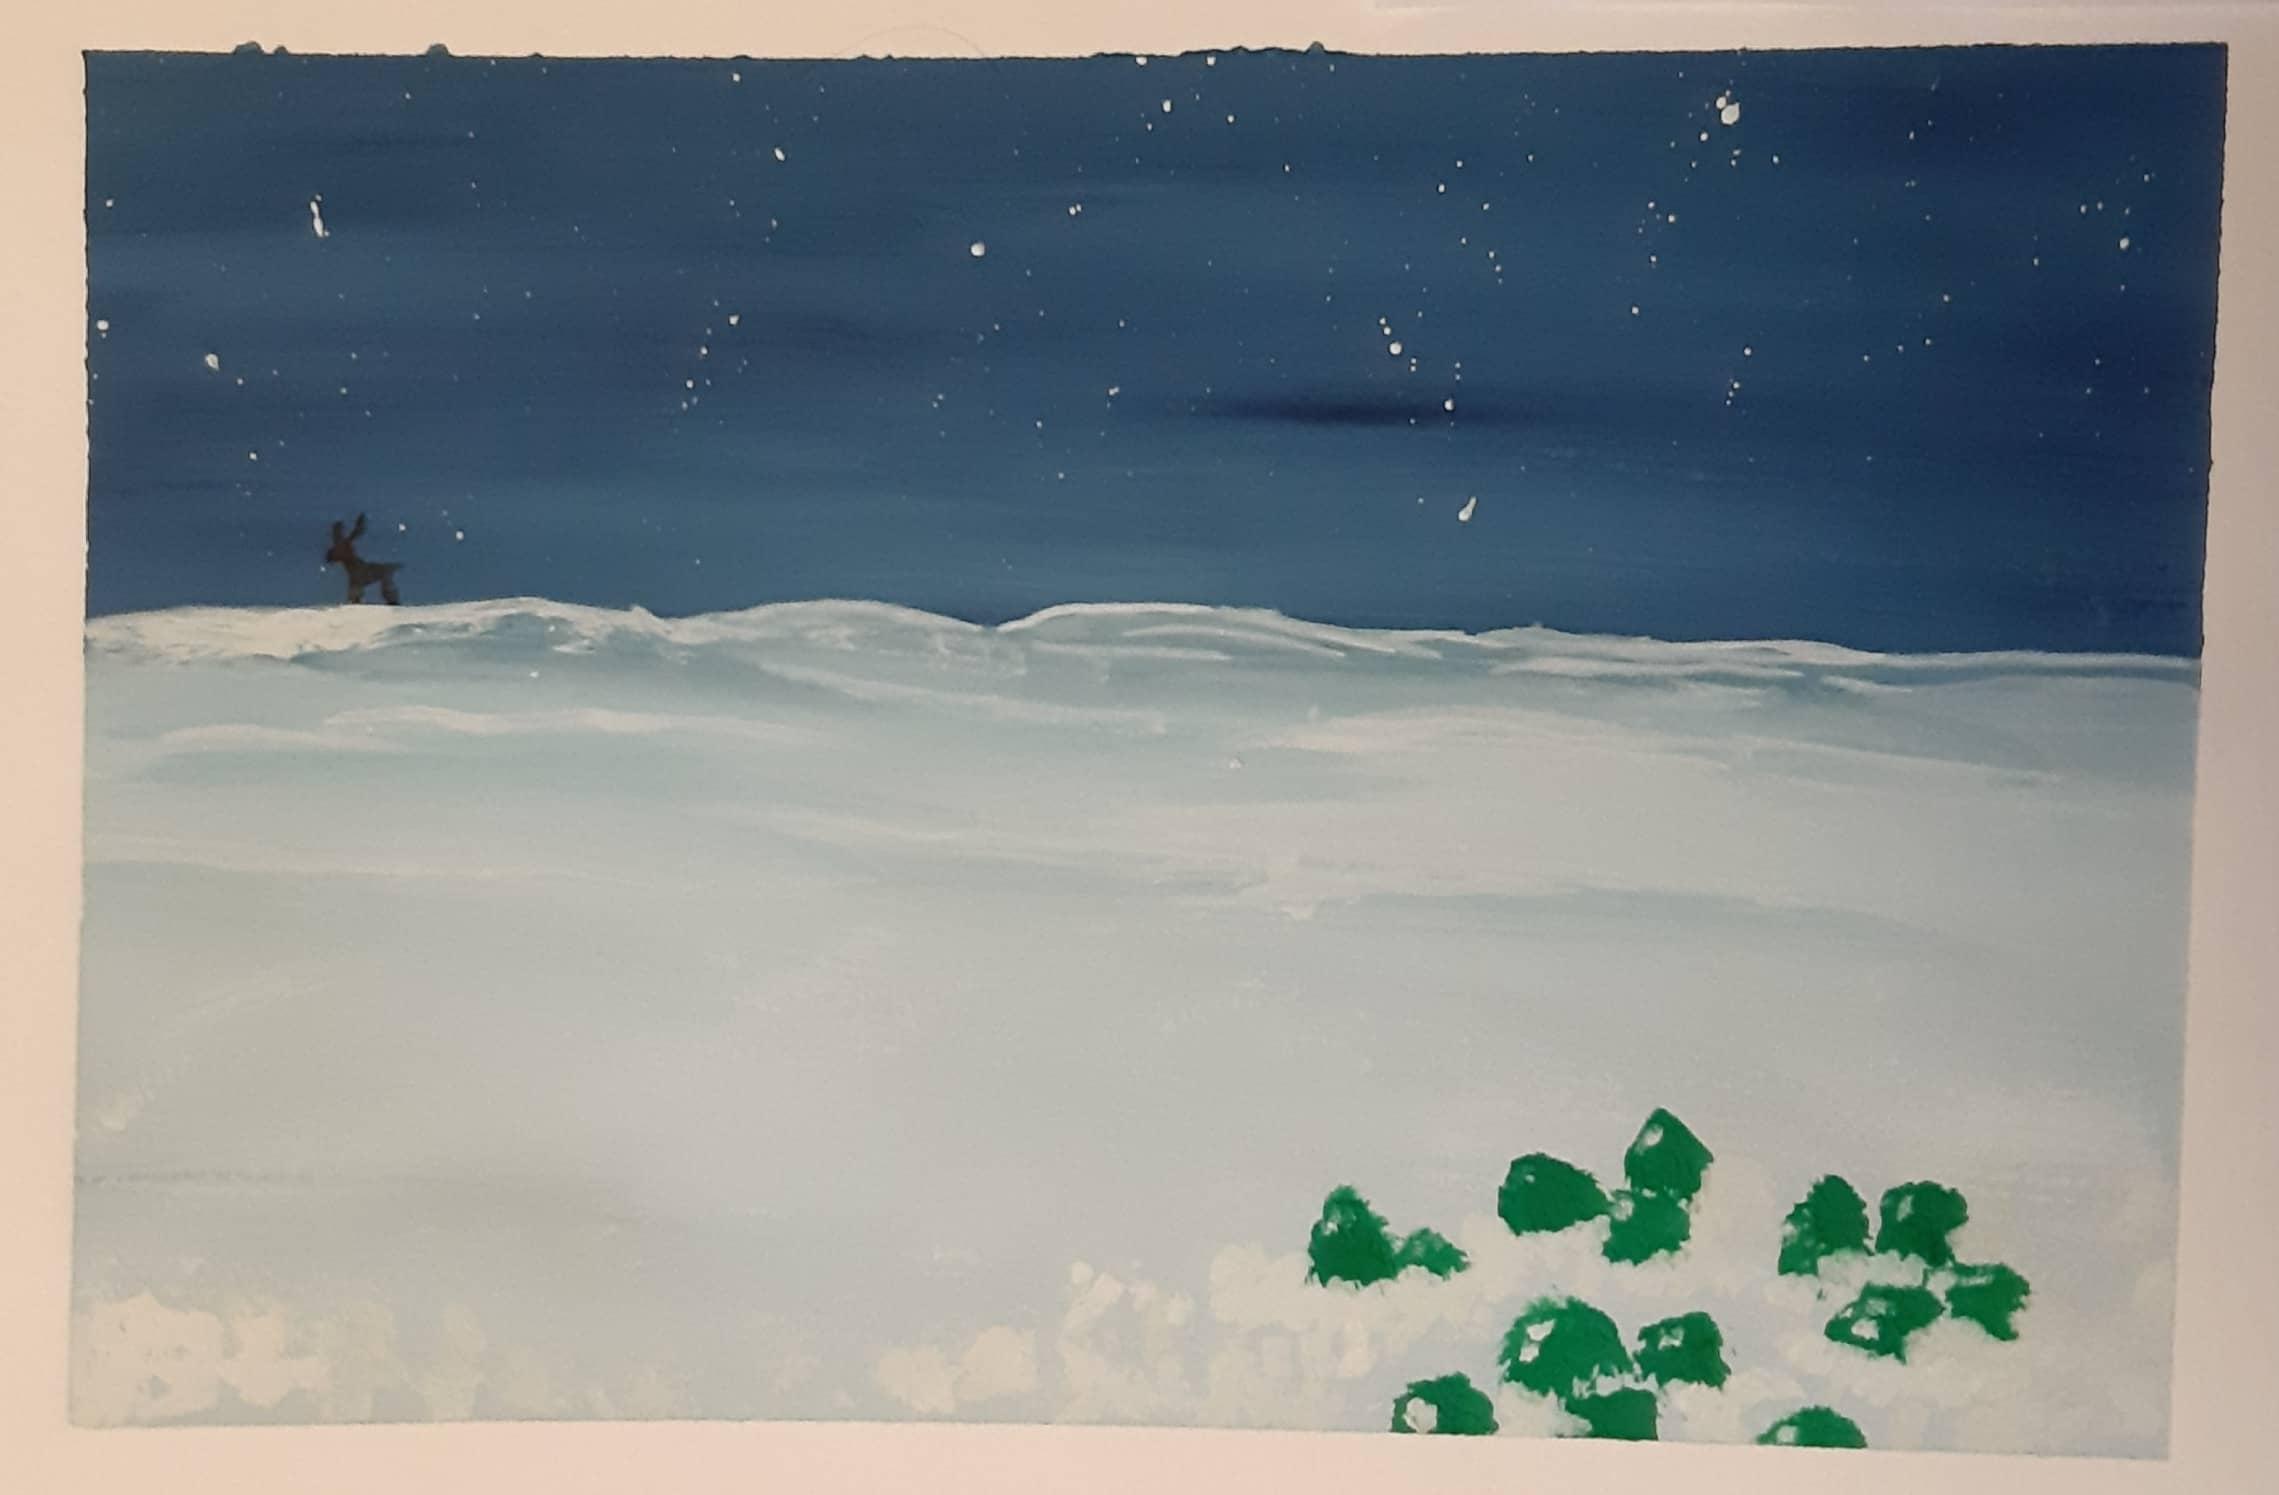 Хризолиты на снегу (по мотивам сказки)